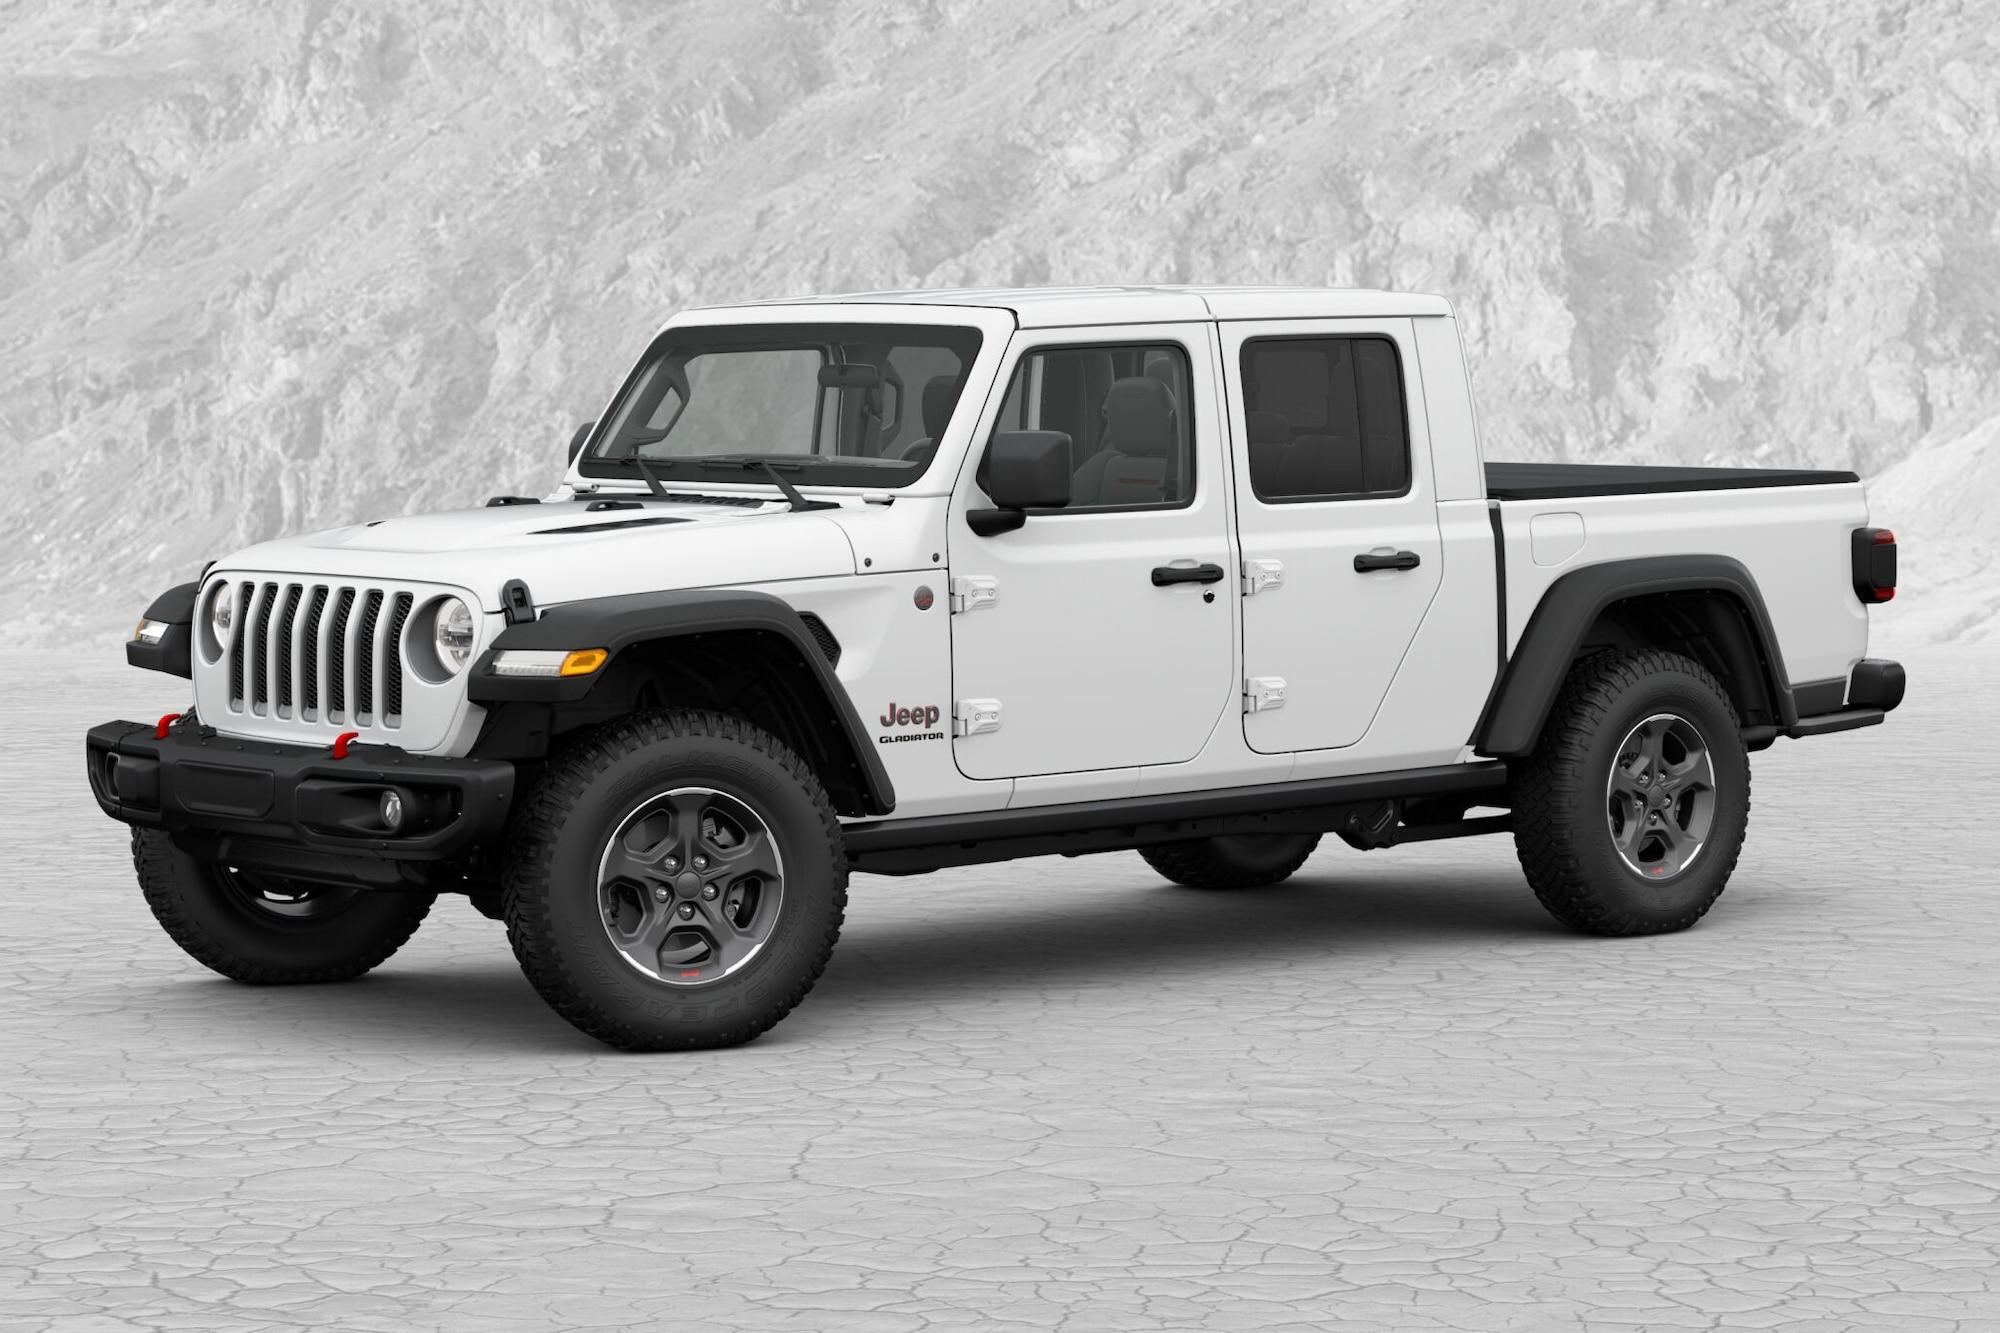 2020 Jeep Gladiator Rubicon How Id Spec It 3